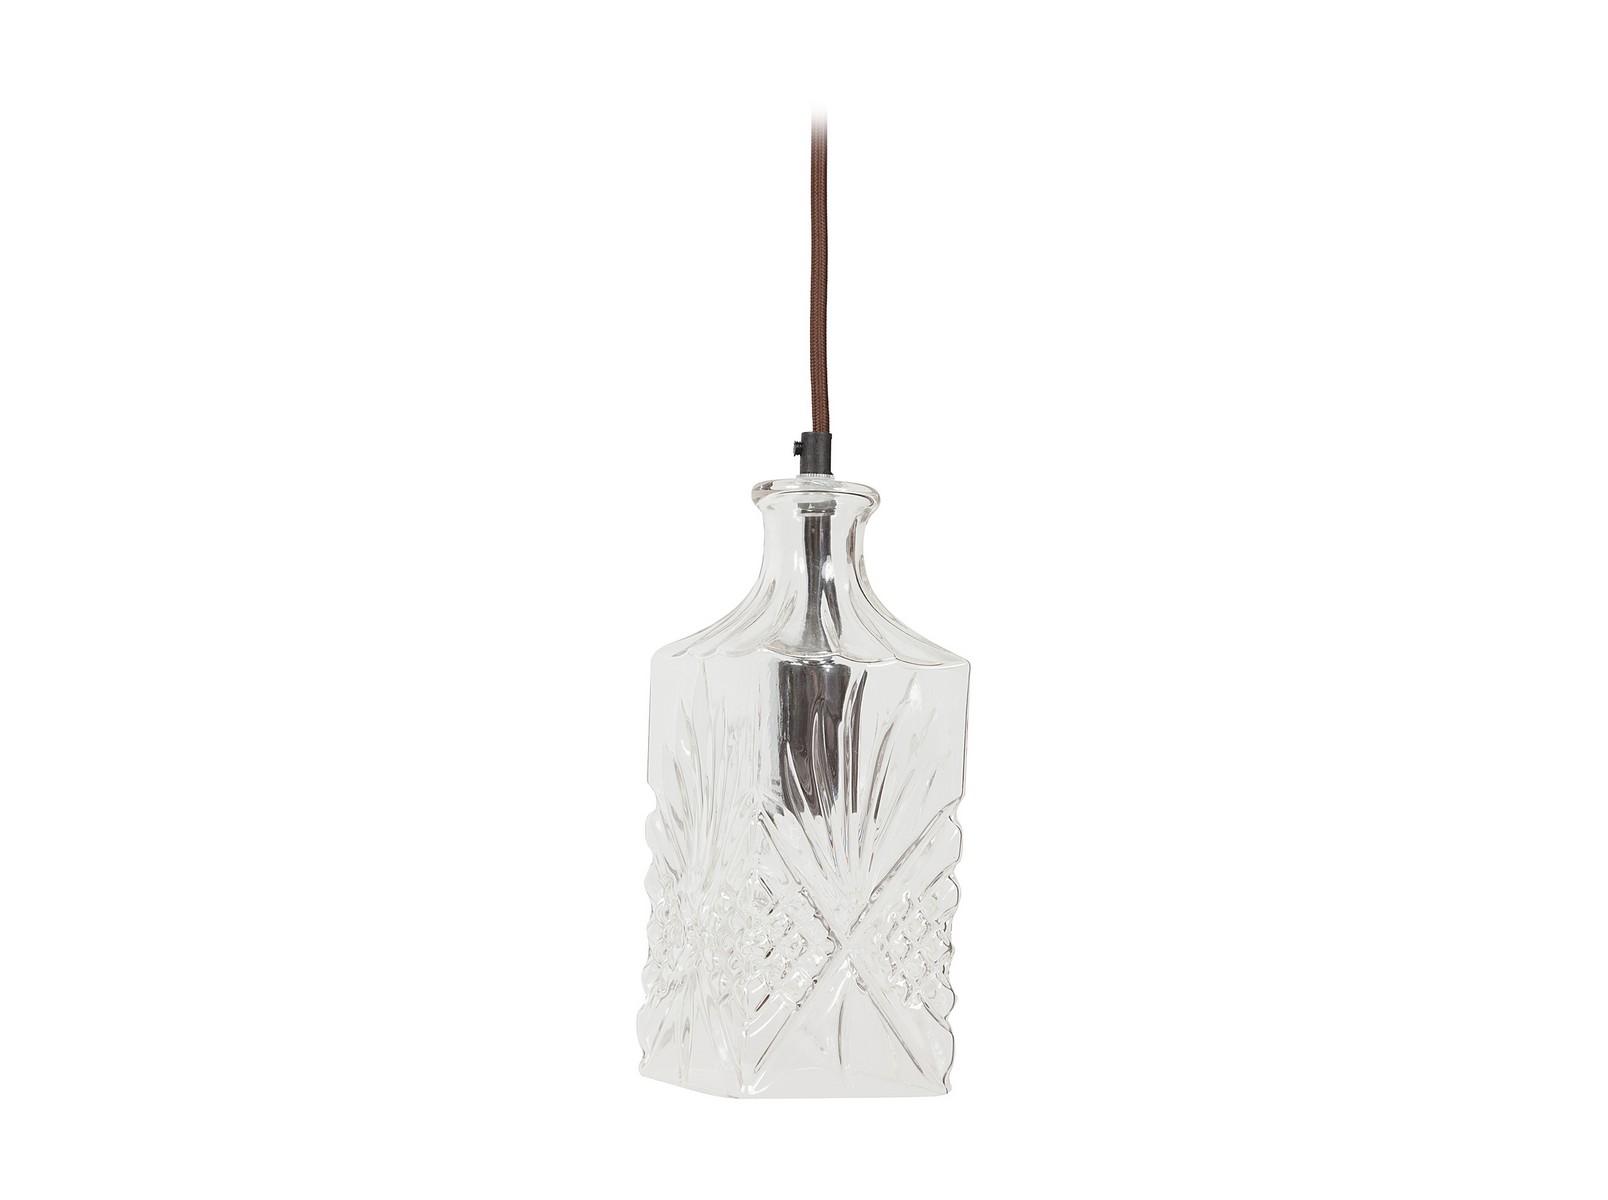 Подвесной светильник VindettaПодвесные светильники<br>&amp;lt;div&amp;gt;Вид цоколя: Е27&amp;lt;/div&amp;gt;&amp;lt;div&amp;gt;Мощность лампы: 40W&amp;lt;/div&amp;gt;&amp;lt;div&amp;gt;Количество ламп: 1&amp;lt;/div&amp;gt;&amp;lt;div&amp;gt;Наличие ламп: нет&amp;lt;/div&amp;gt;<br><br>Material: Стекло<br>Ширина см: 10<br>Высота см: 26<br>Глубина см: 10